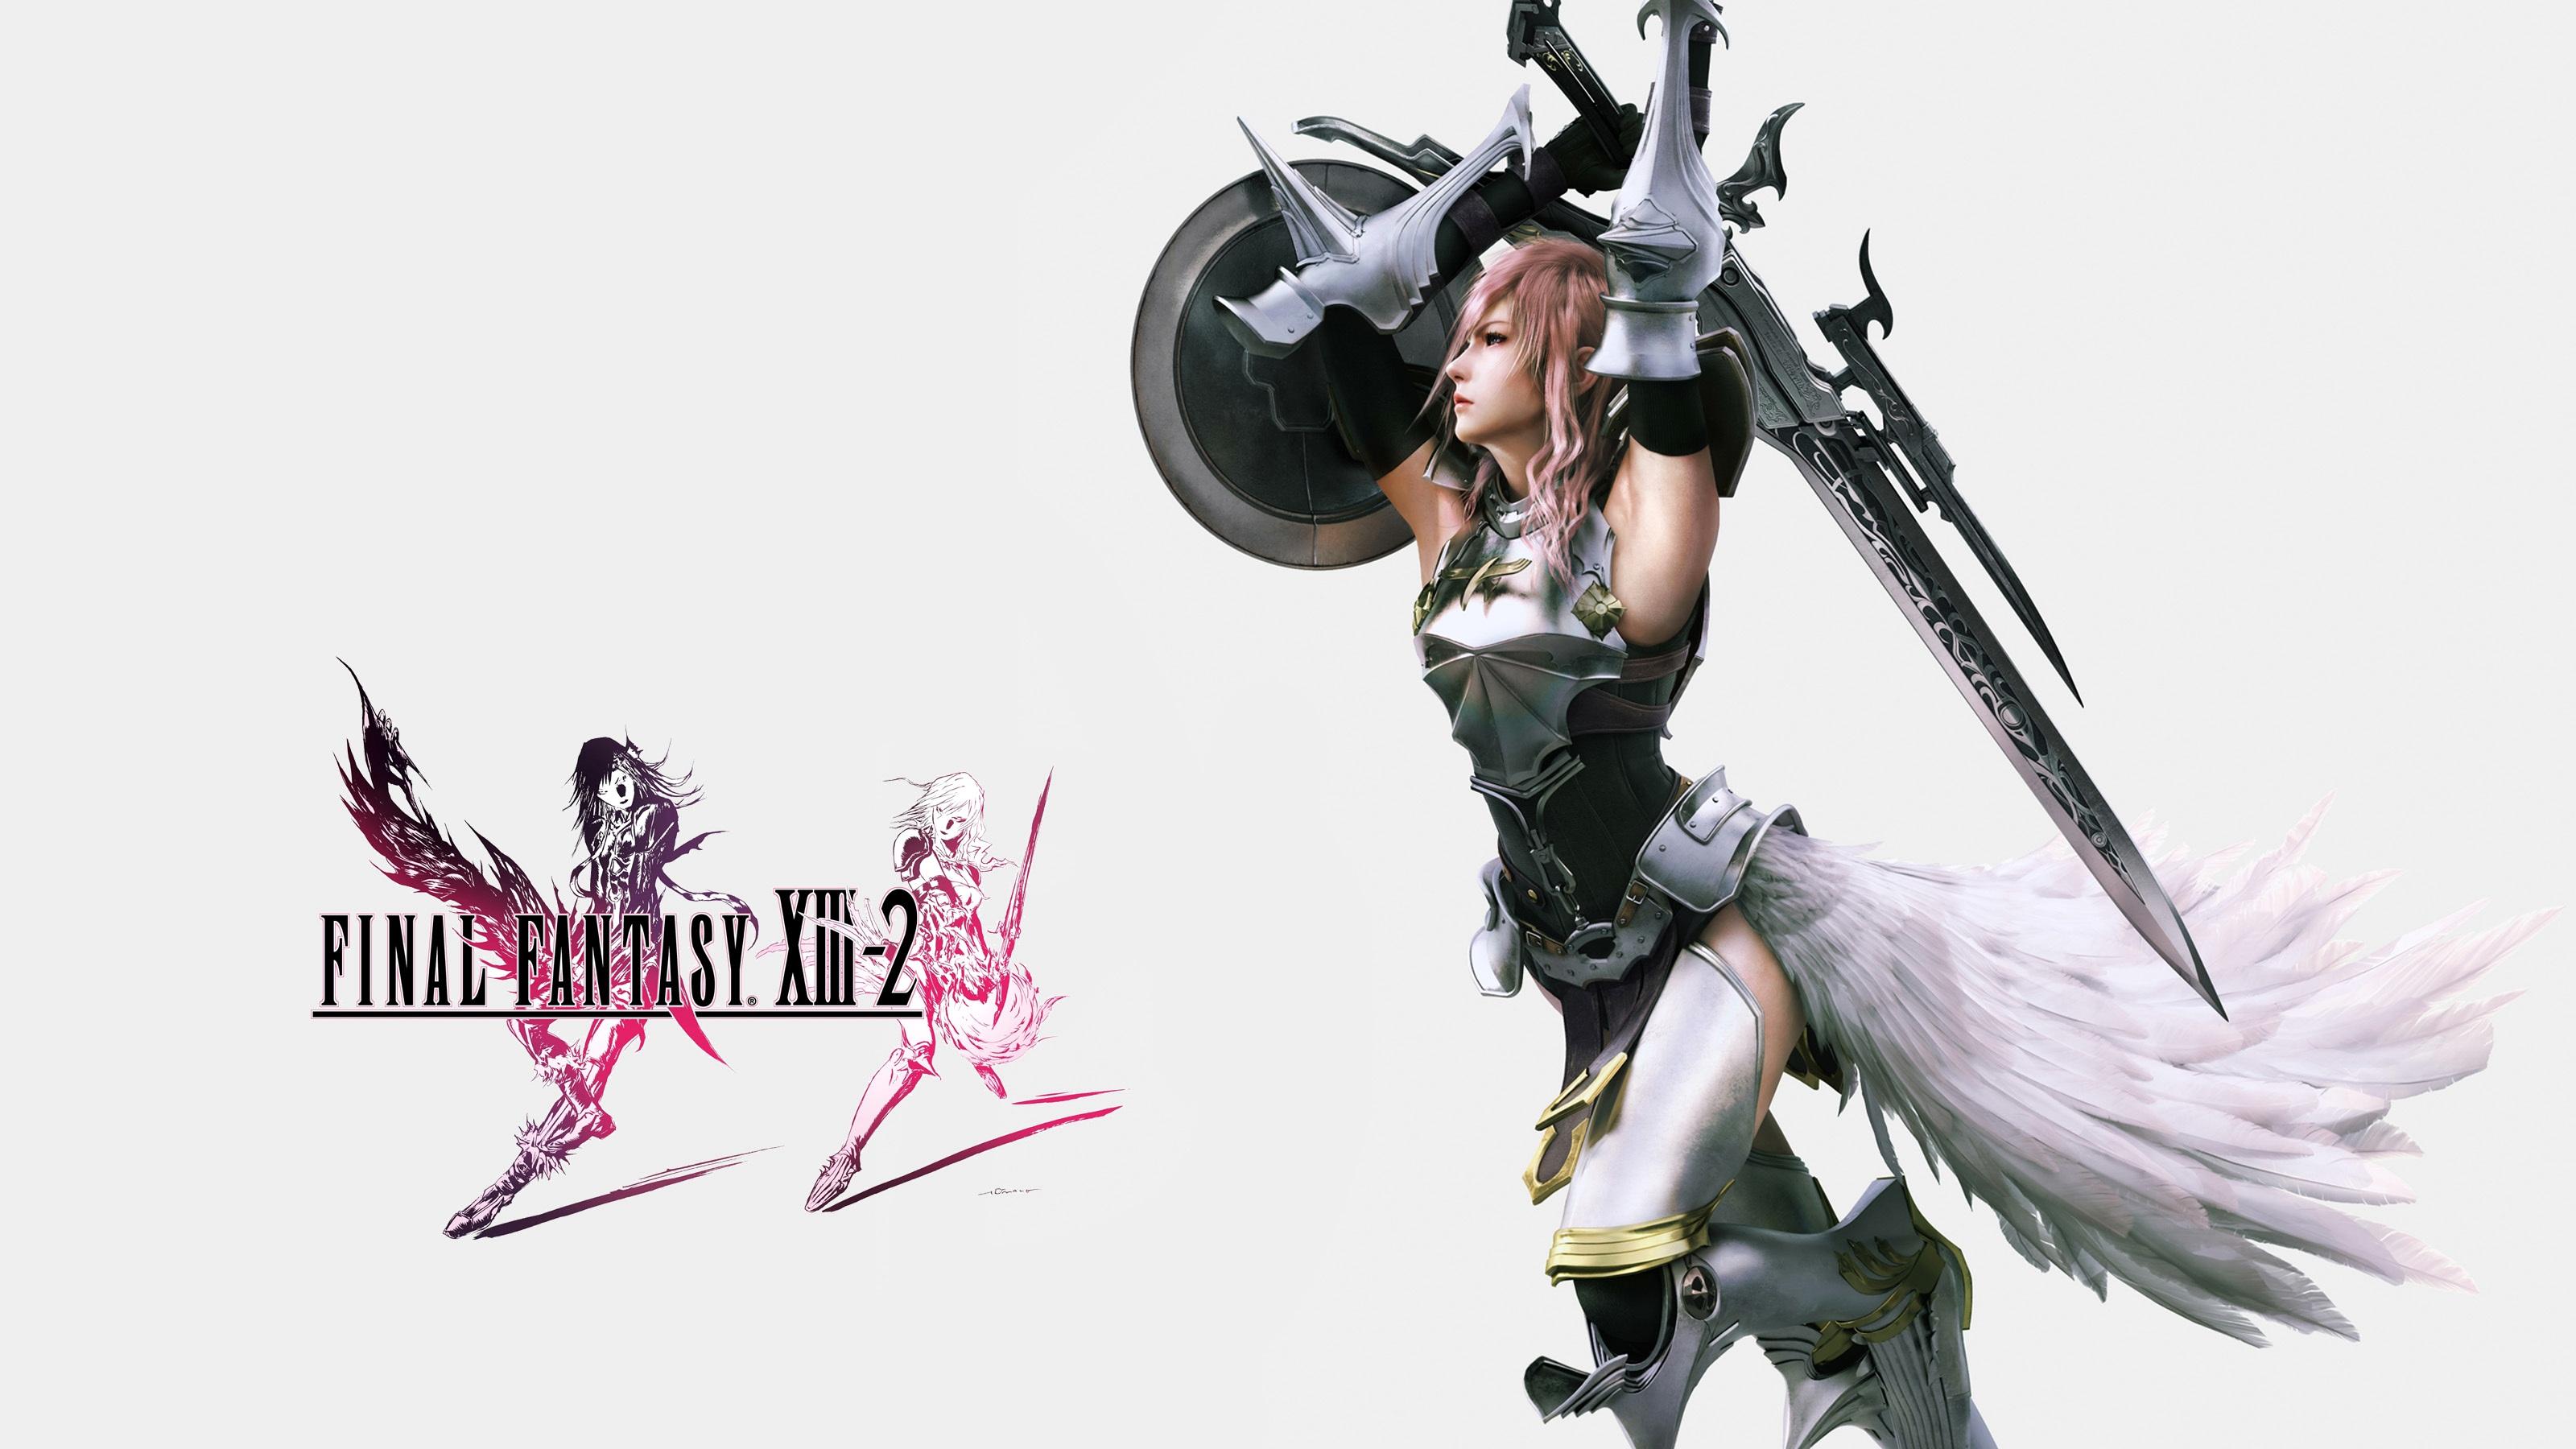 Le logo de Final Fantasy XIII-2